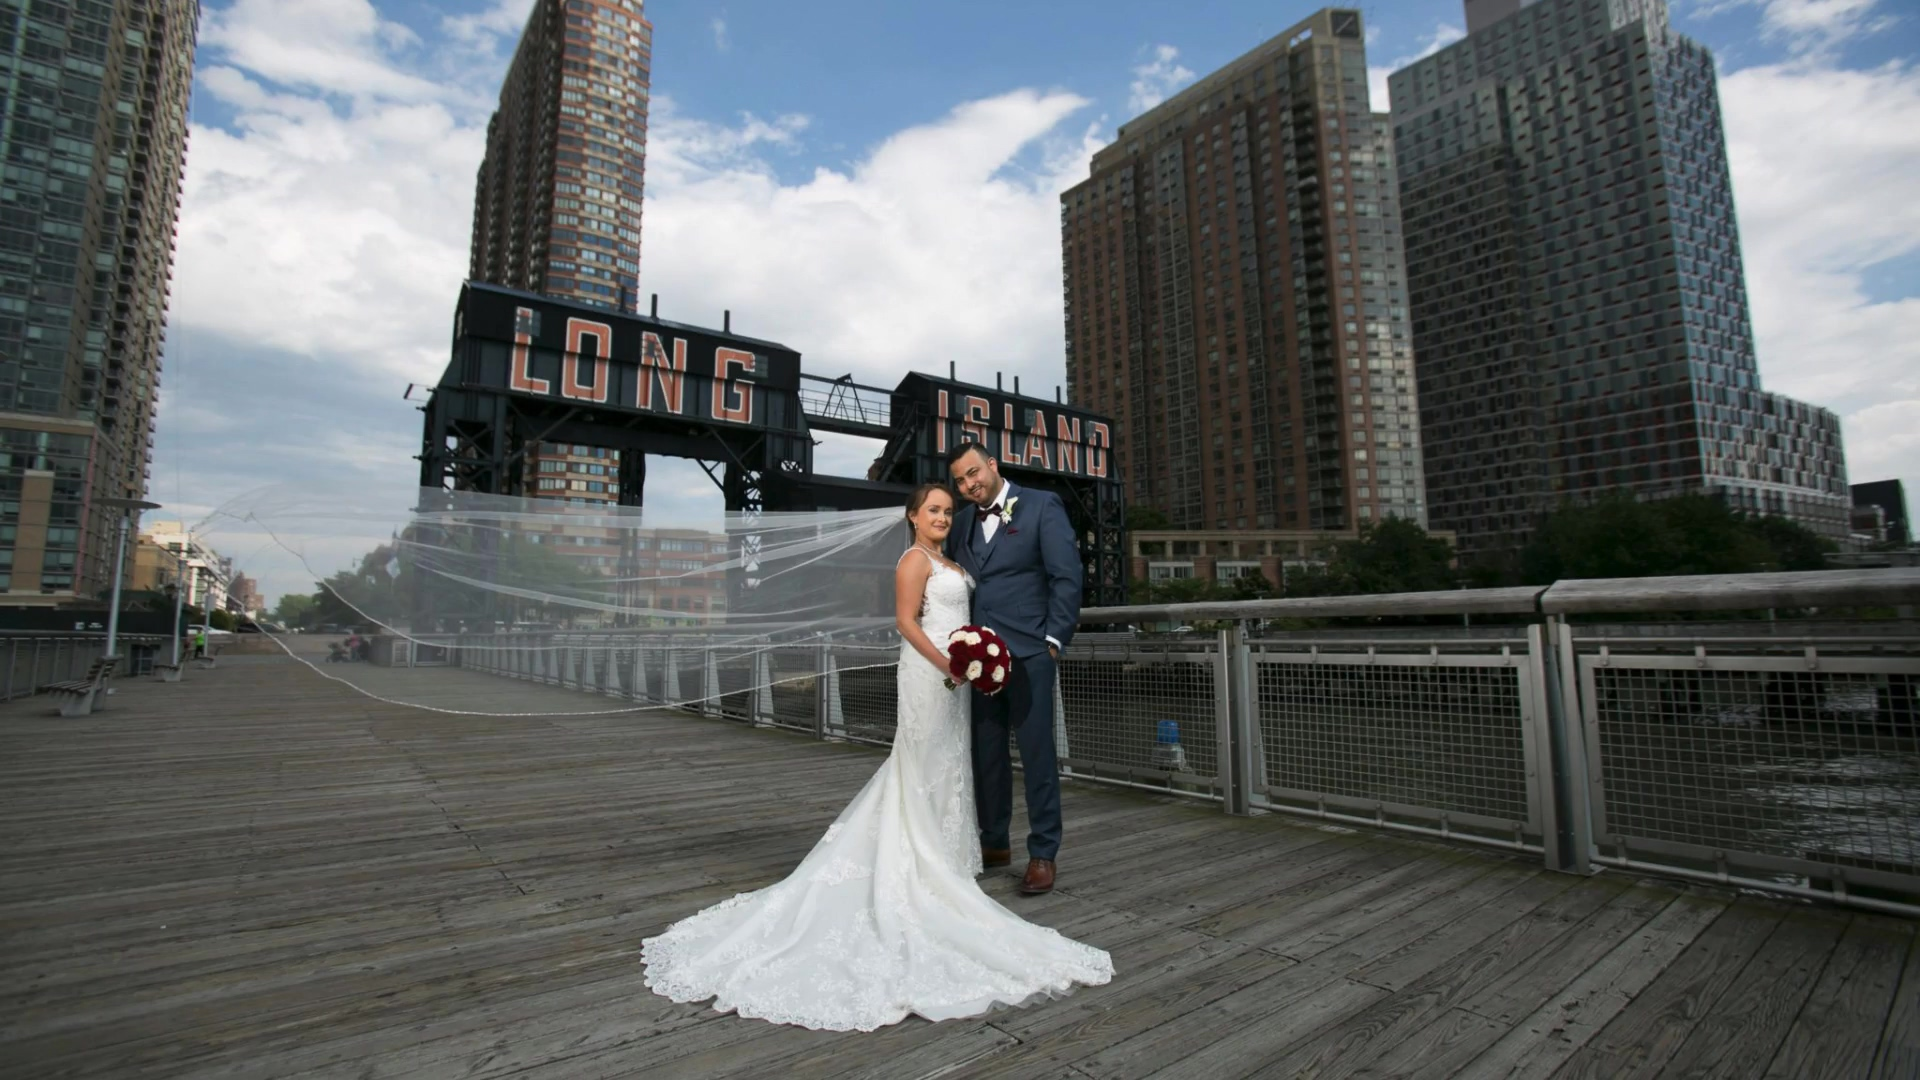 2020_Wedding_Photos_at_Long_Island_City_1080p